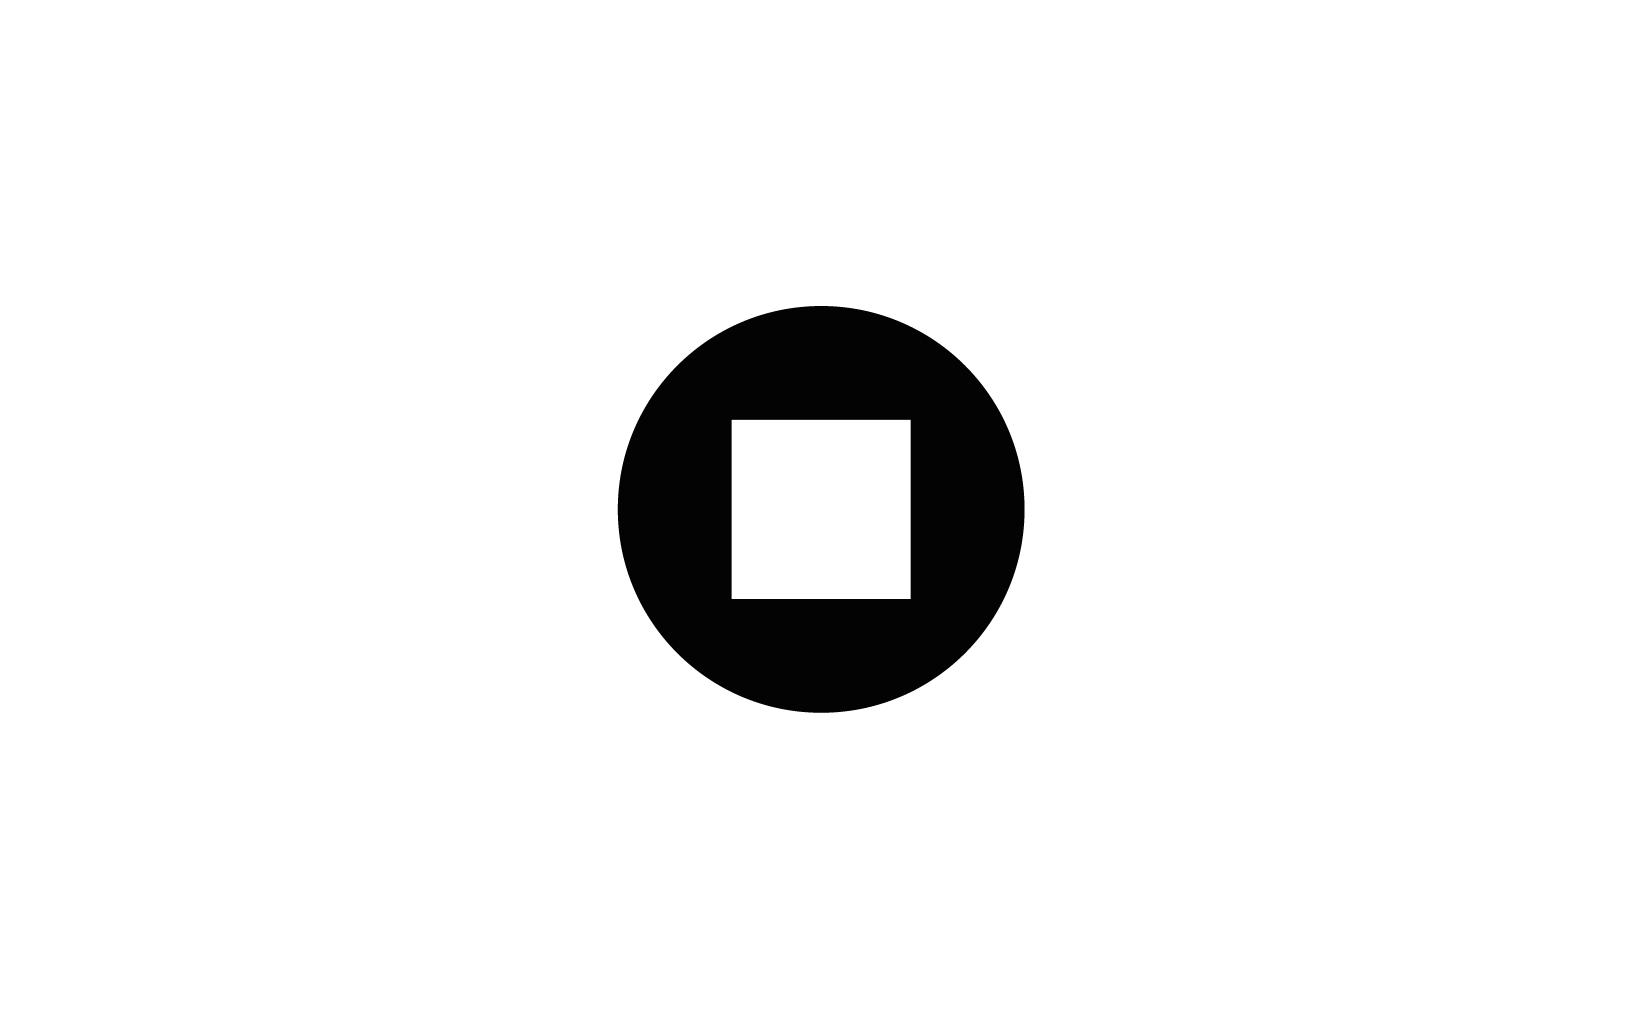 bp_plain_some_logo